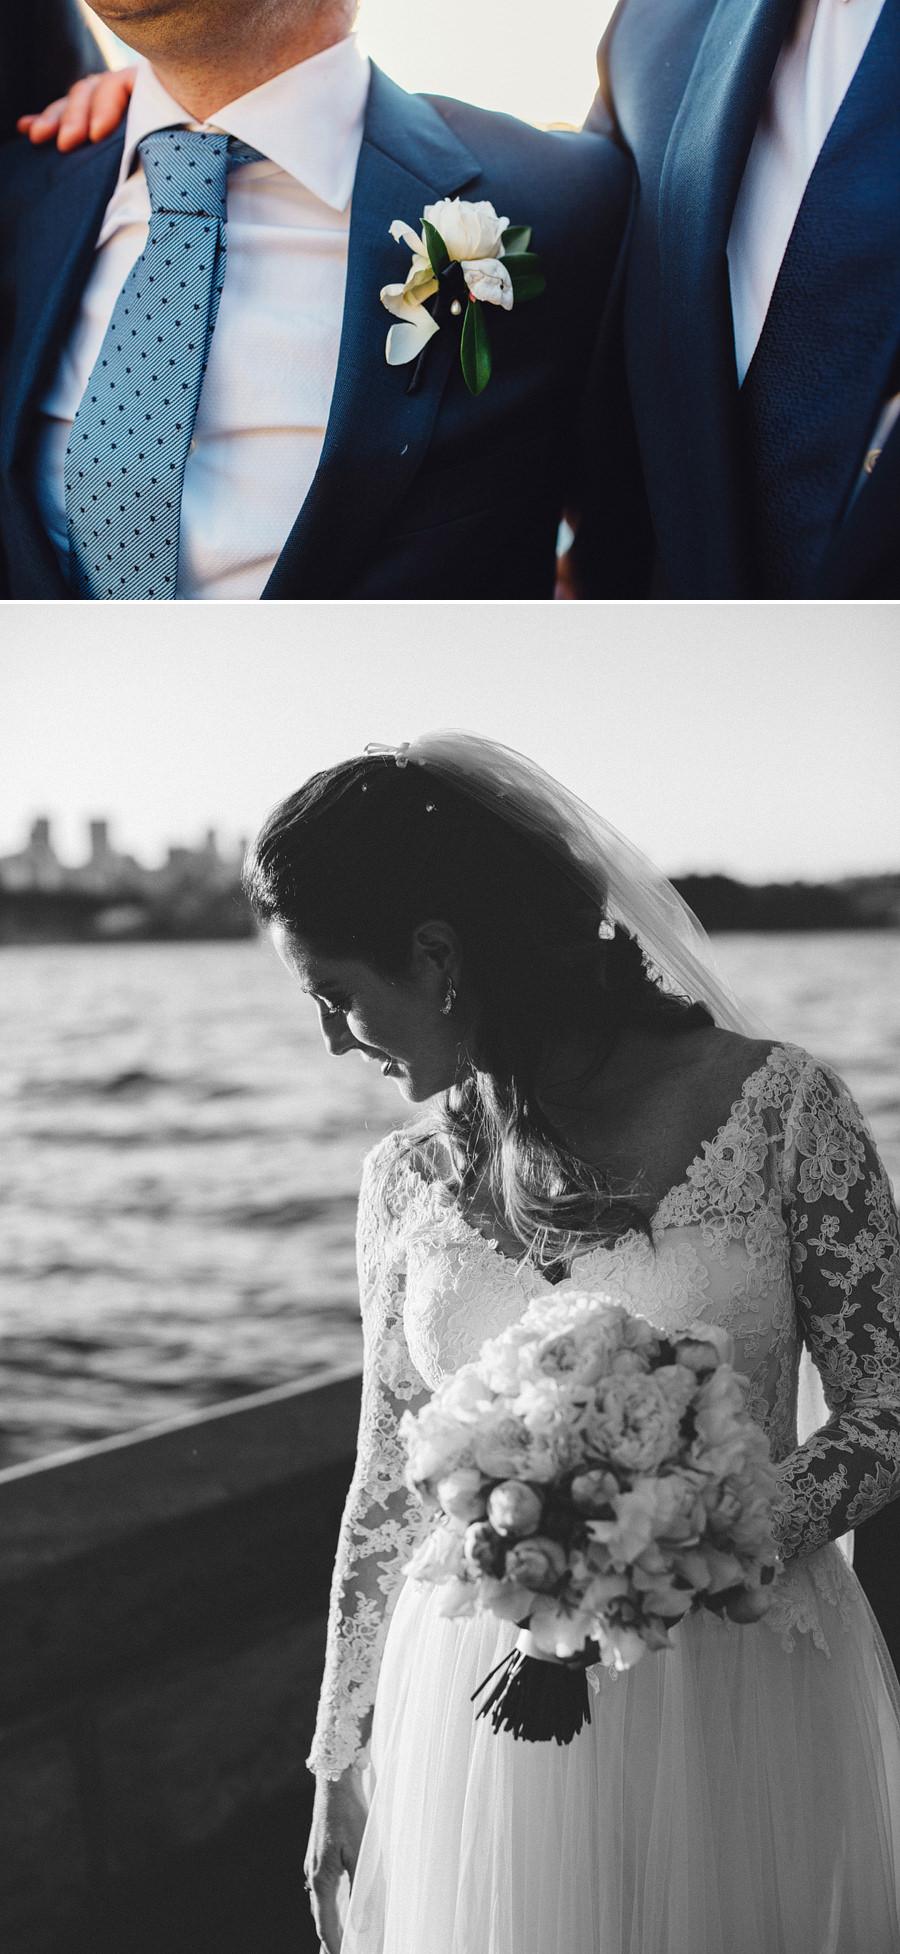 Mrs Macquarie's Chair Wedding Photography: Portraits